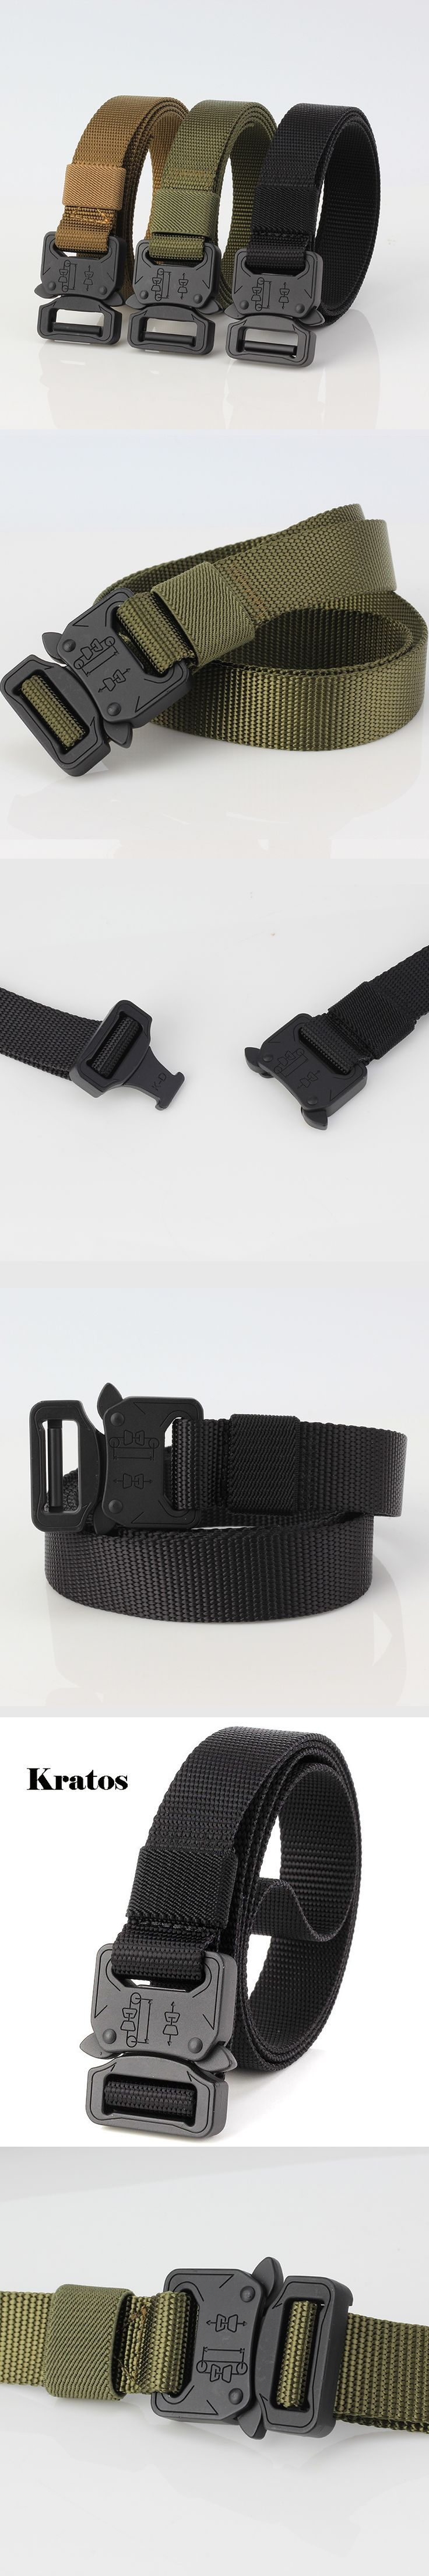 SWAT Combat Military Equipment Tactical Belt Men Nylon Cobra tactical belt  US Army Soldier Carry Waist Belts Metal Buckle 4.5cm